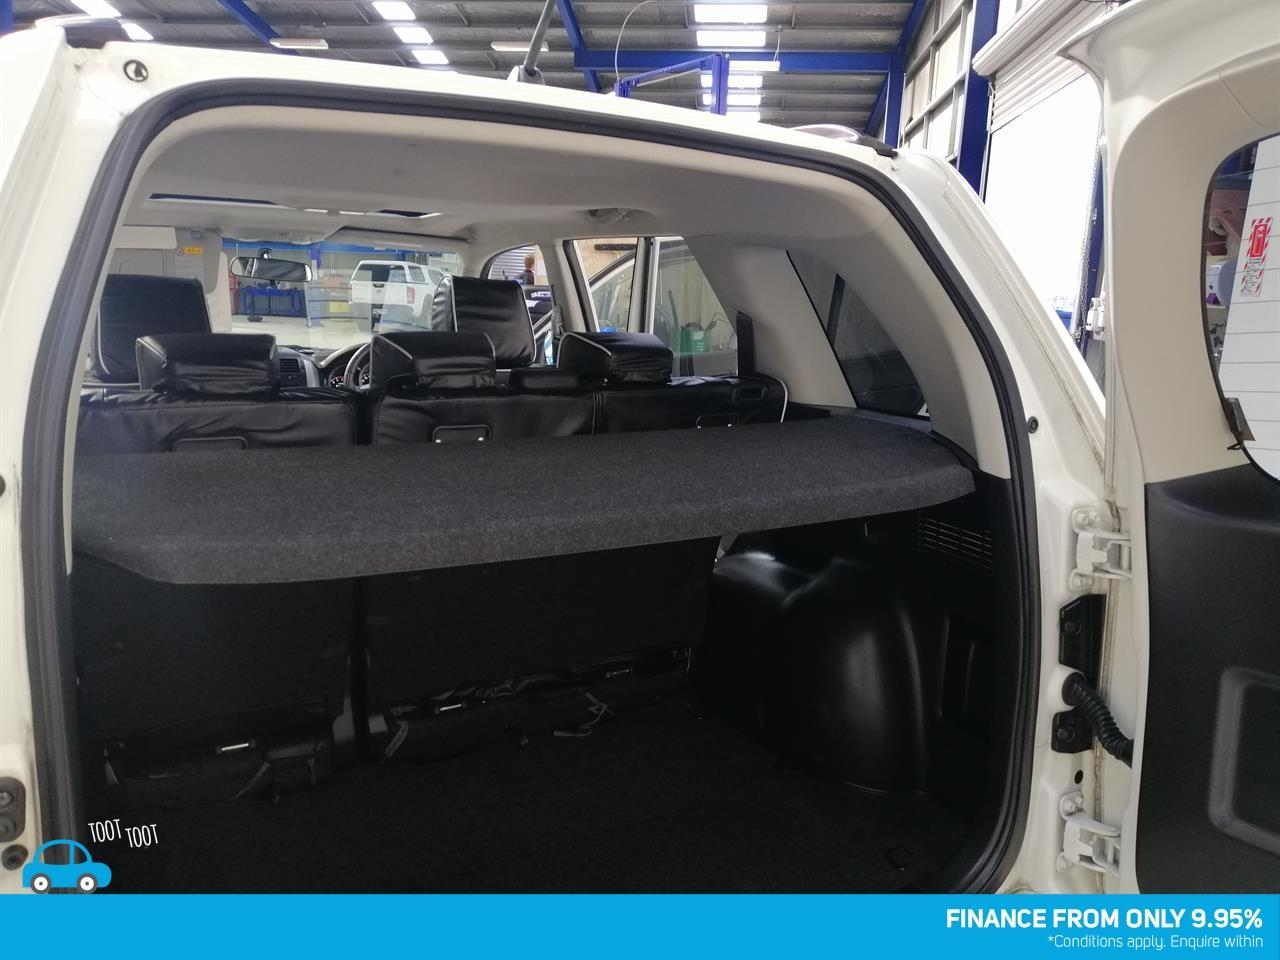 image-8, 2013 Suzuki ESCUDO CROSS ADVENTURE at Dunedin